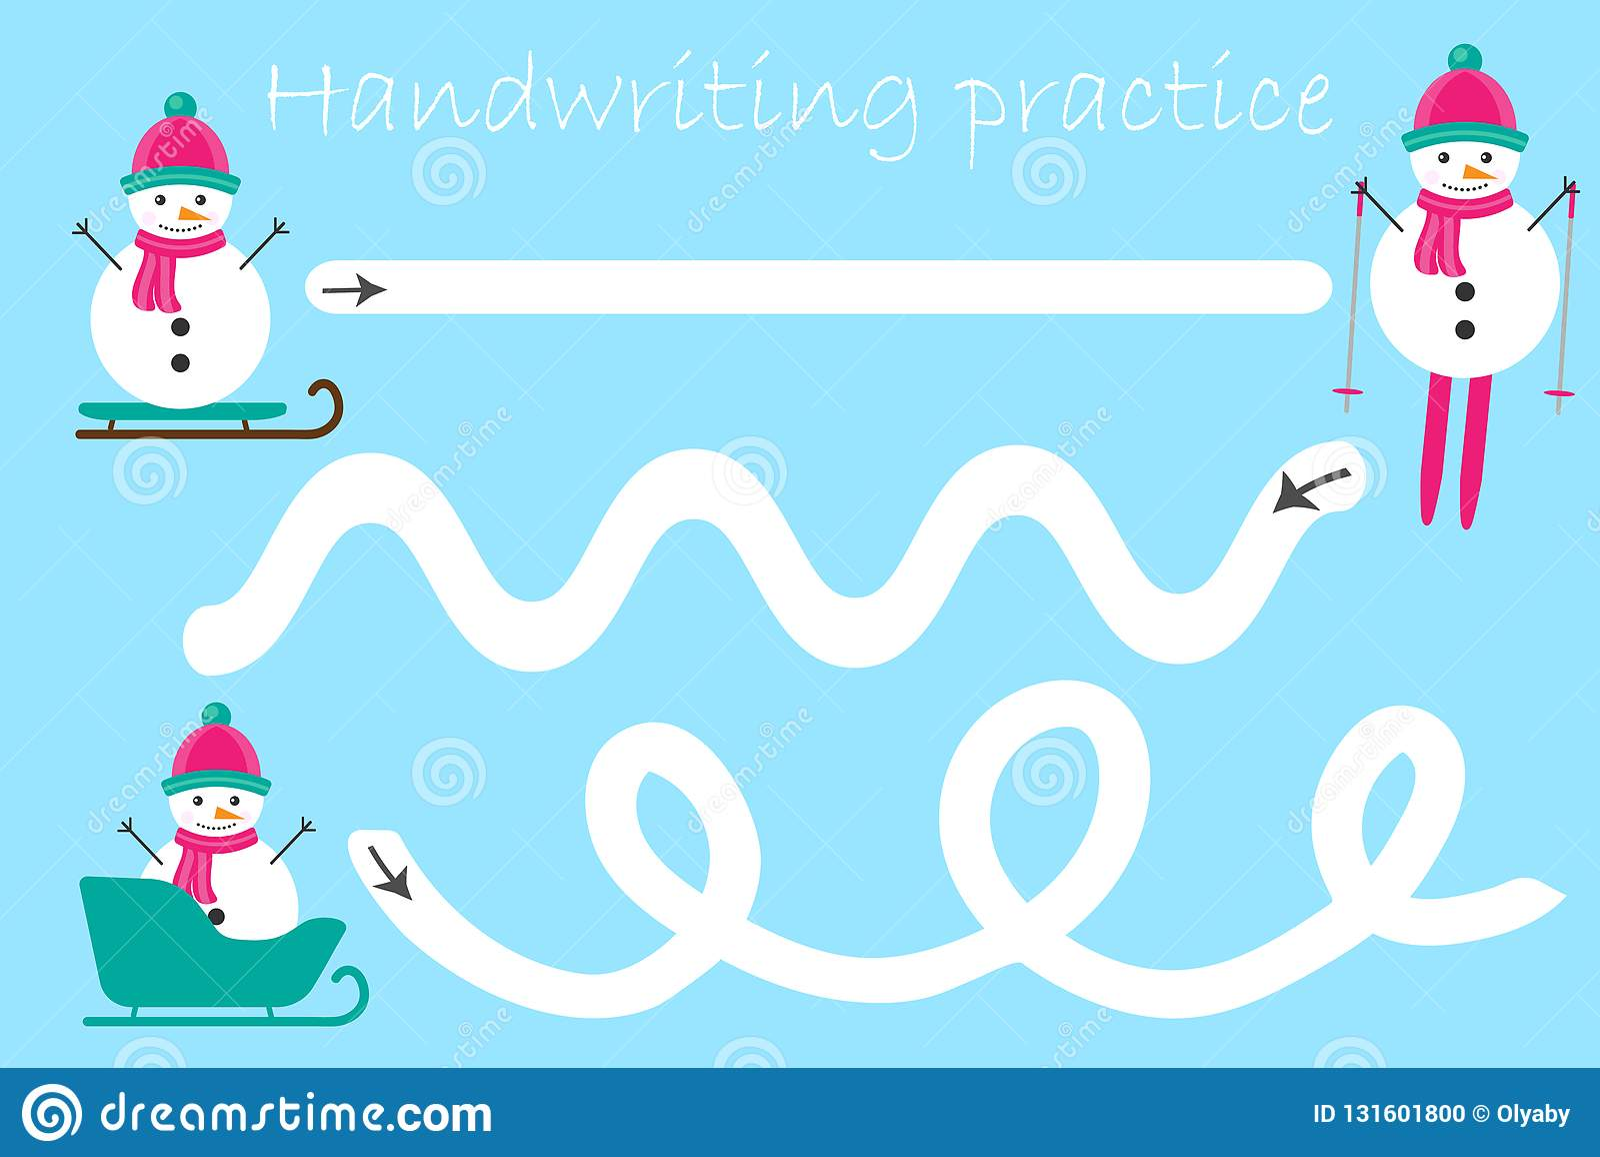 Handwriting Practice Sheet Christmas Theme Snowmen Kids